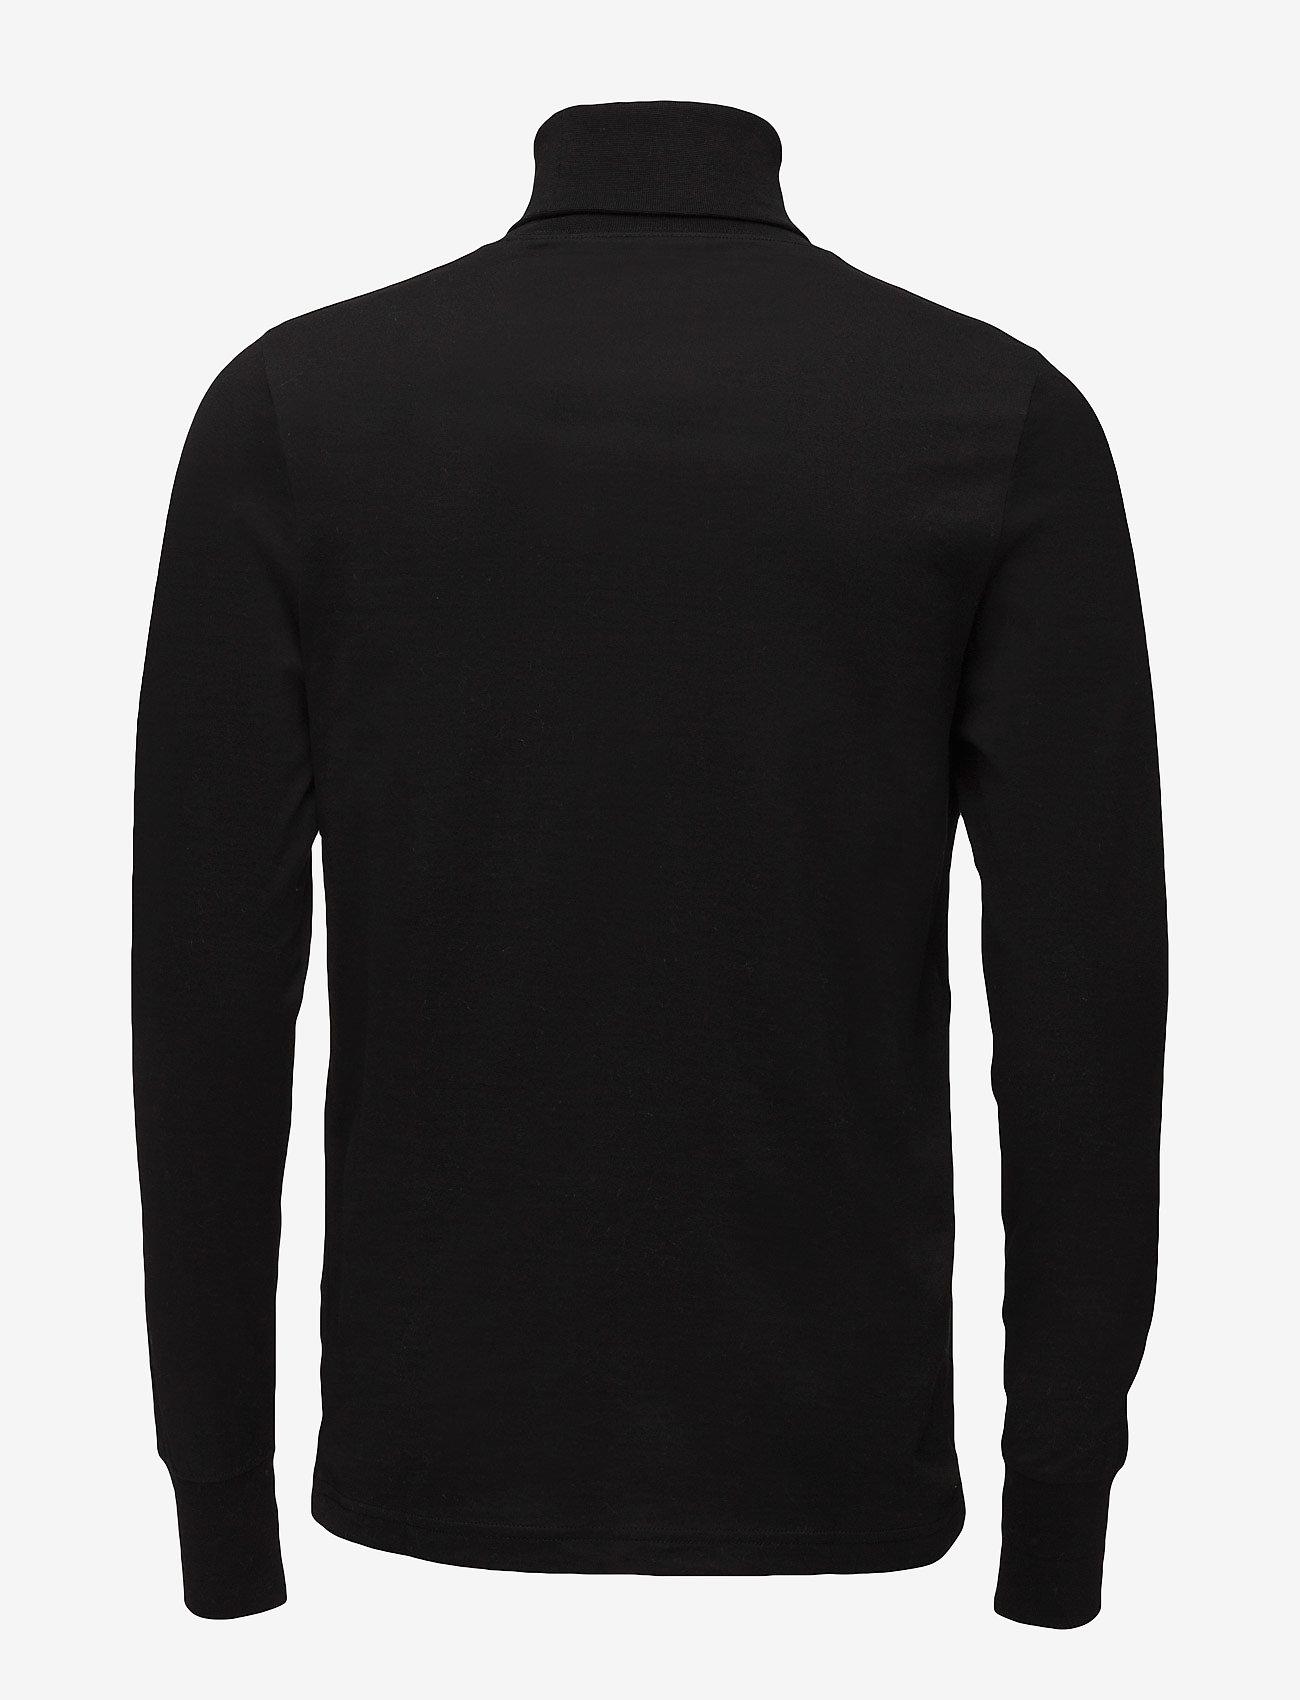 Lacoste - TEE-SHIRT&TURTLE NECK - golfy - black - 1